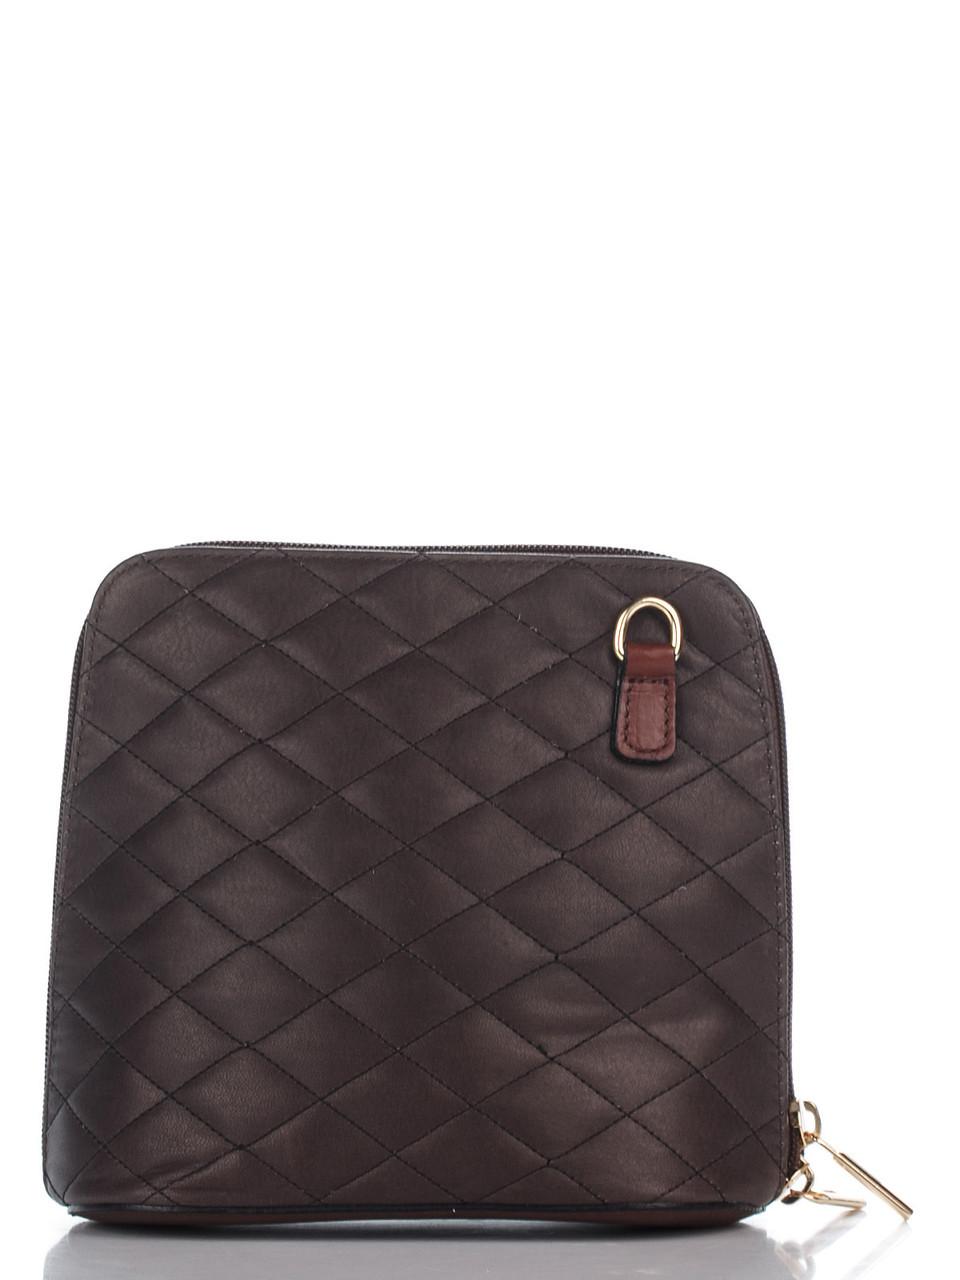 Брендовая сумка RAMONA  кросс боди Diva's Bag темно-коричневая 17 см х 17 см х 9 см